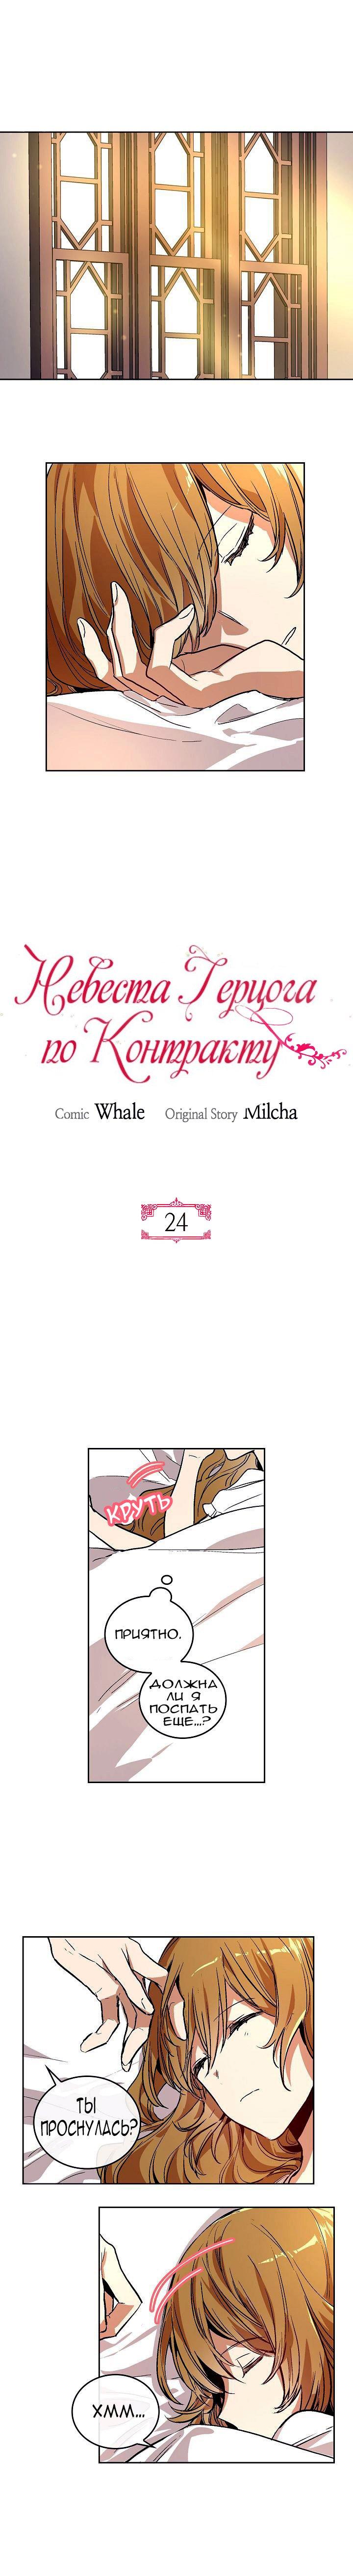 Манга Невеста герцога по контракту  - Том 1 Глава 24 Страница 2